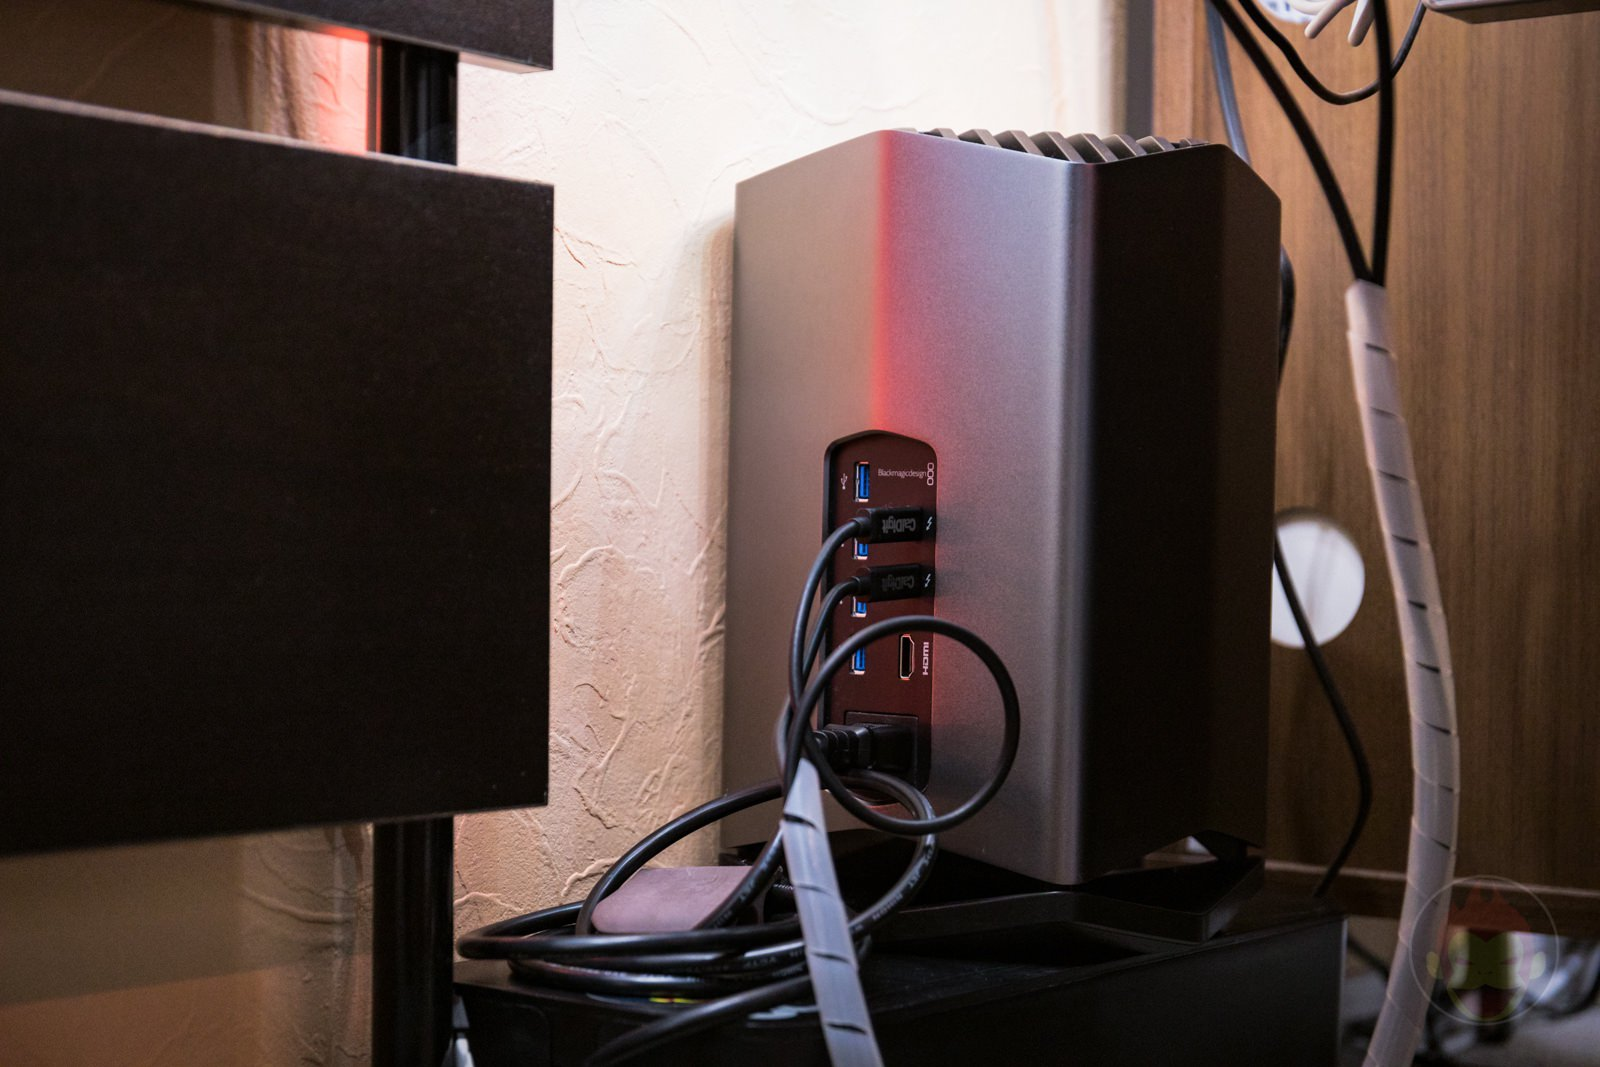 Using eGPU definately changes heat on MacBookPro 06